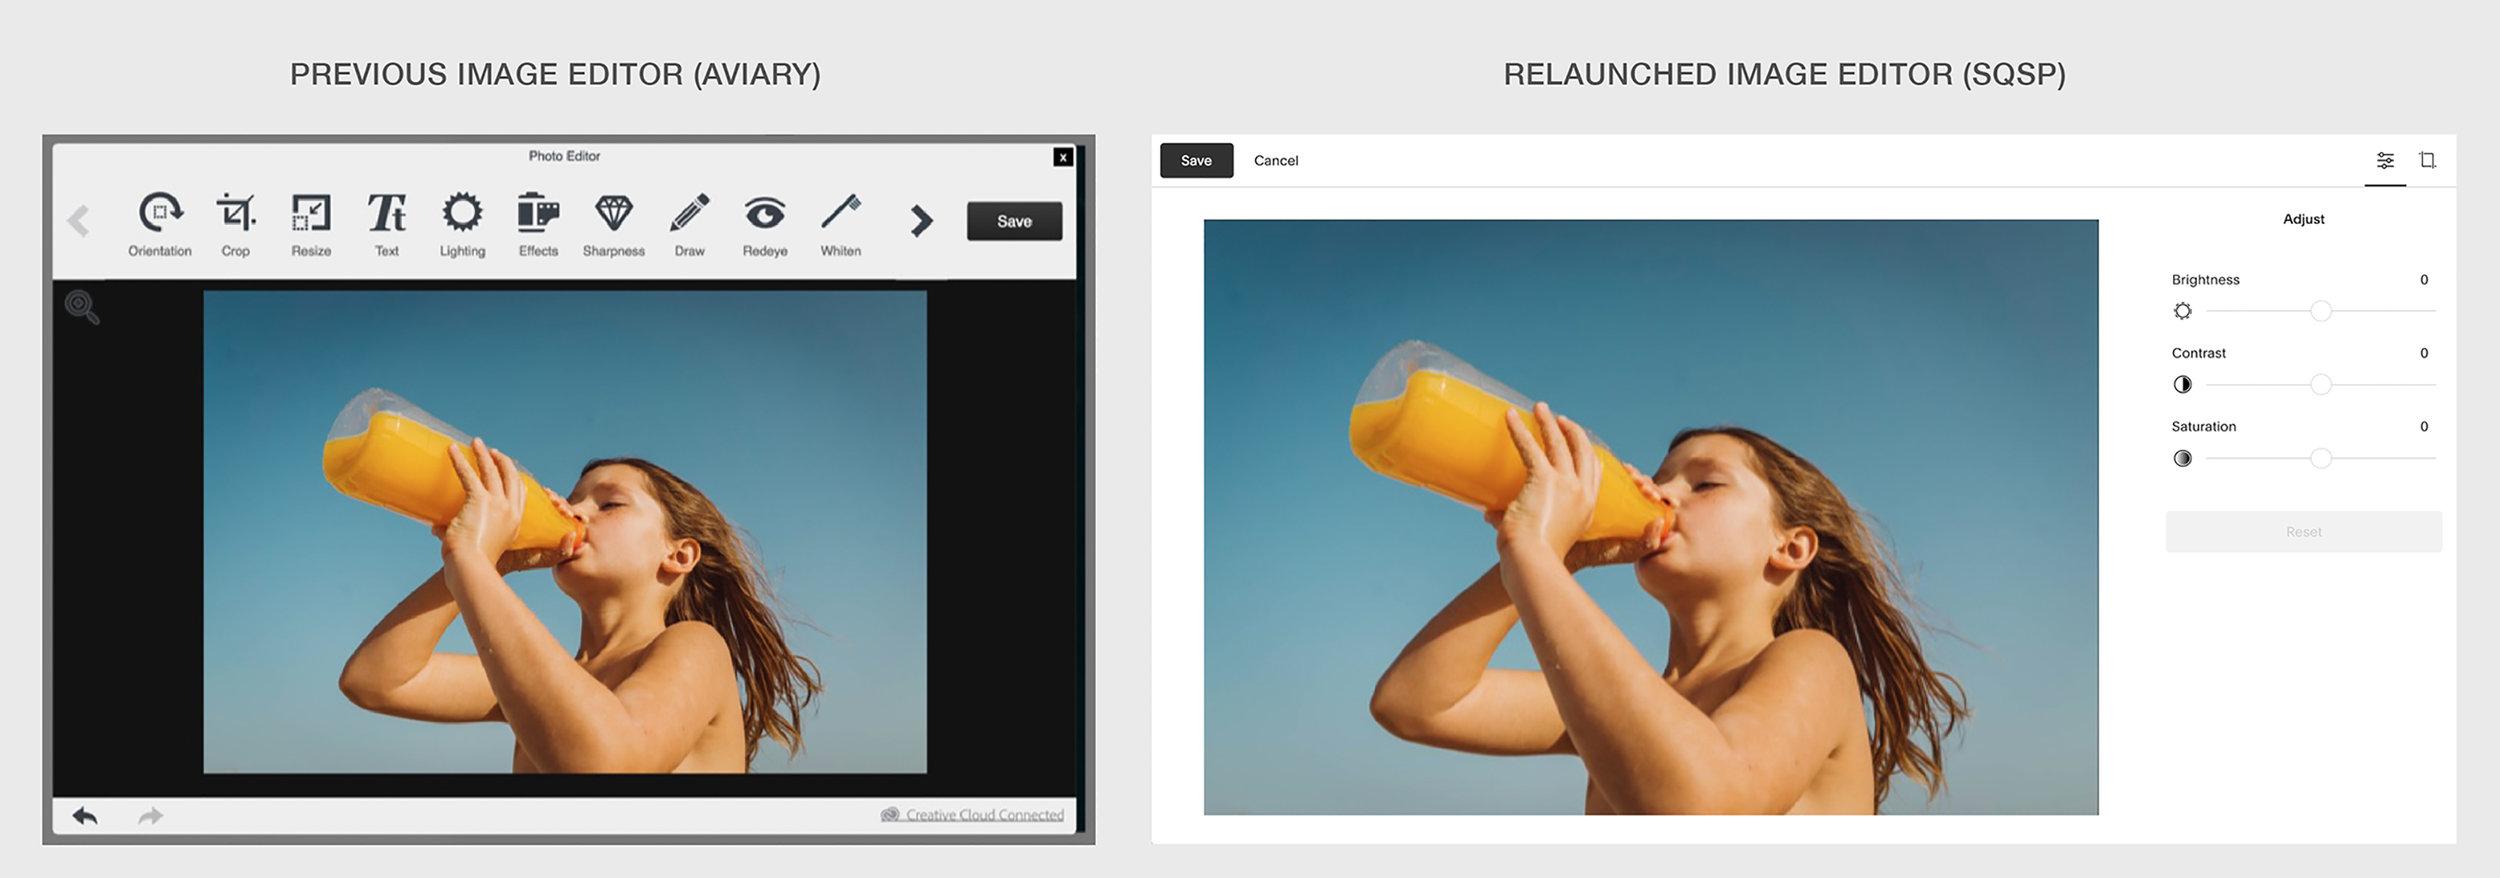 Image Editor_comparison.jpg